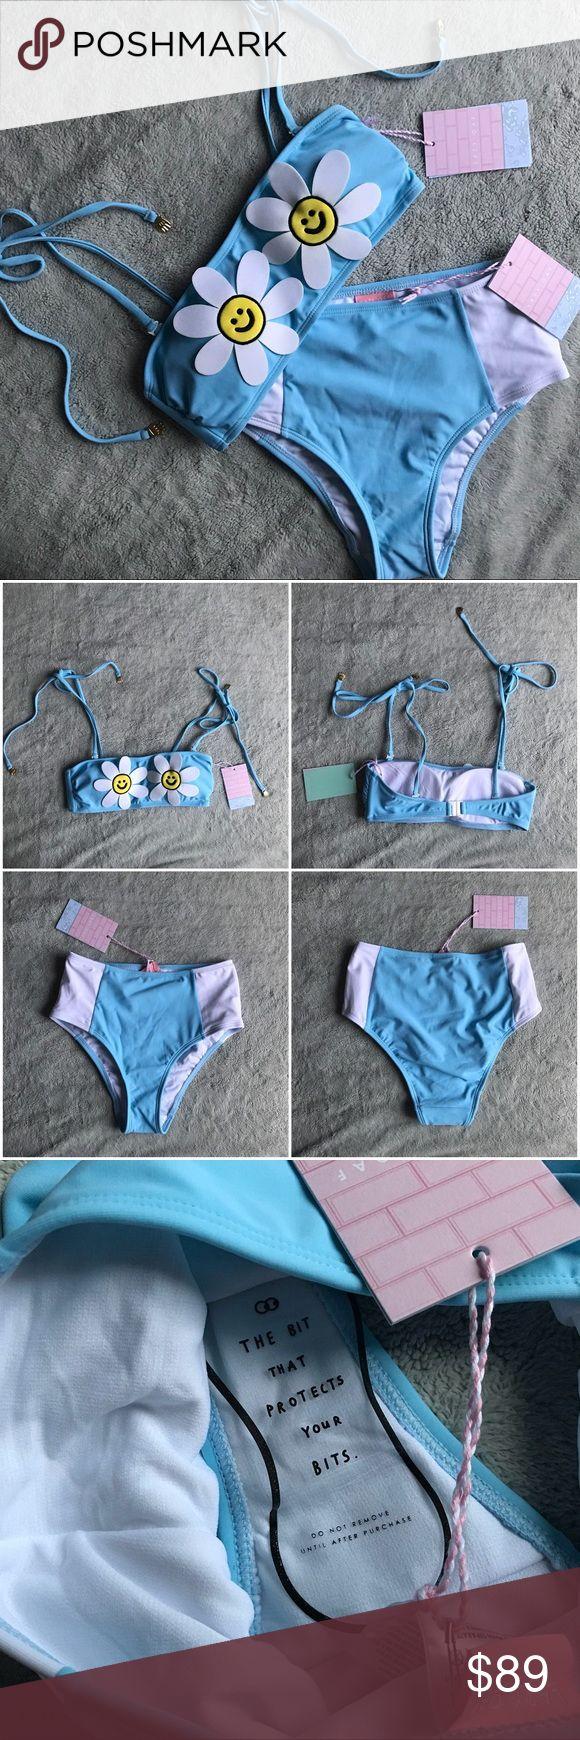 NWT Lazy Oaf Daisy Boob Bikini Floral Swimsuit Set Brand new, never worn. Daisy ... 1